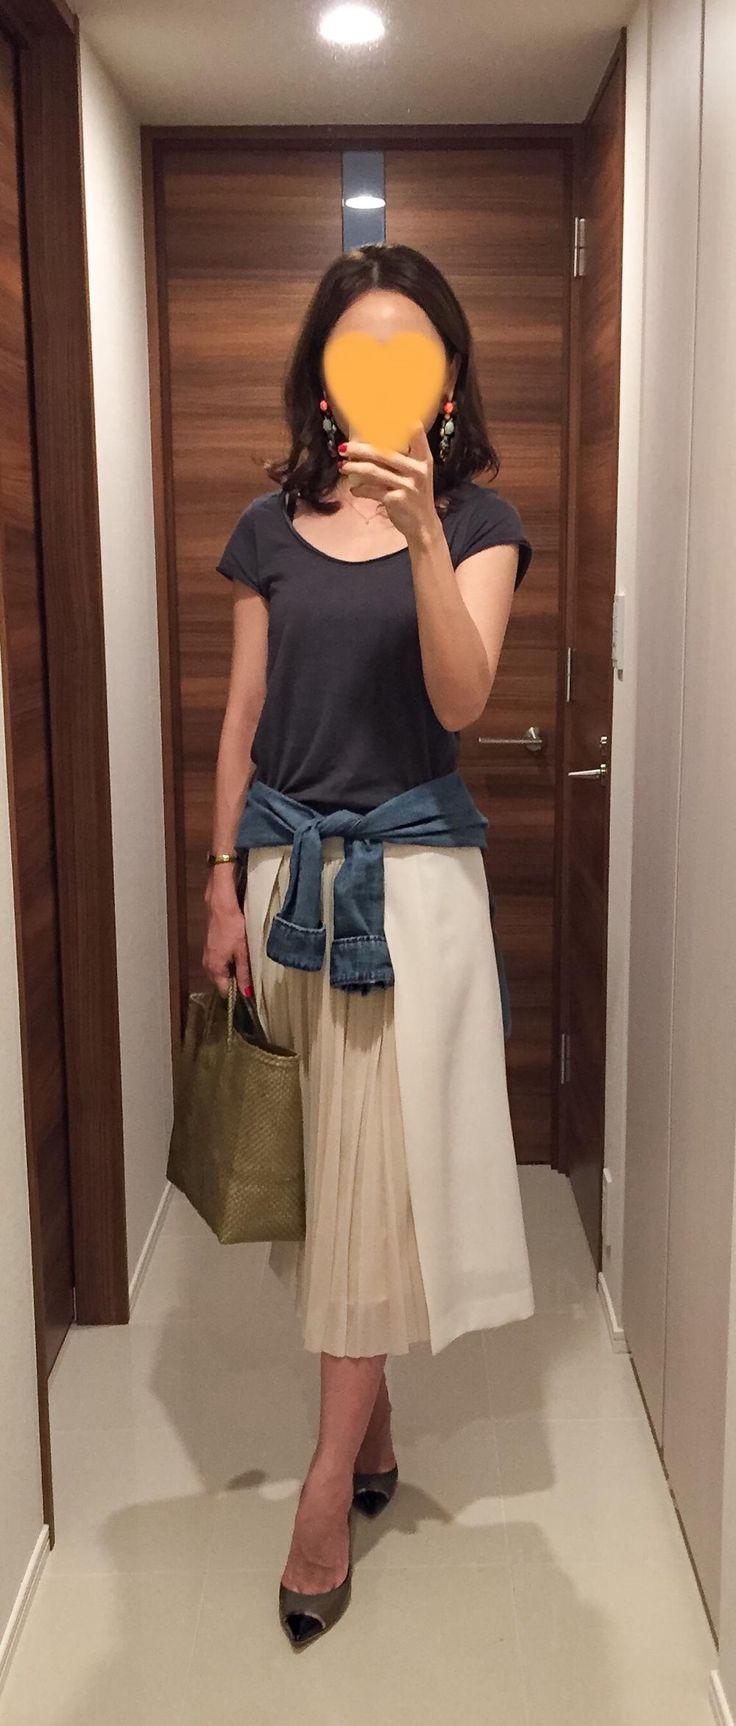 Grey tee: SISLEY, Denim shirt: H&M, White long skirt: Des Pres, Bag: la kagu, Beige heels: Jimmy Choo